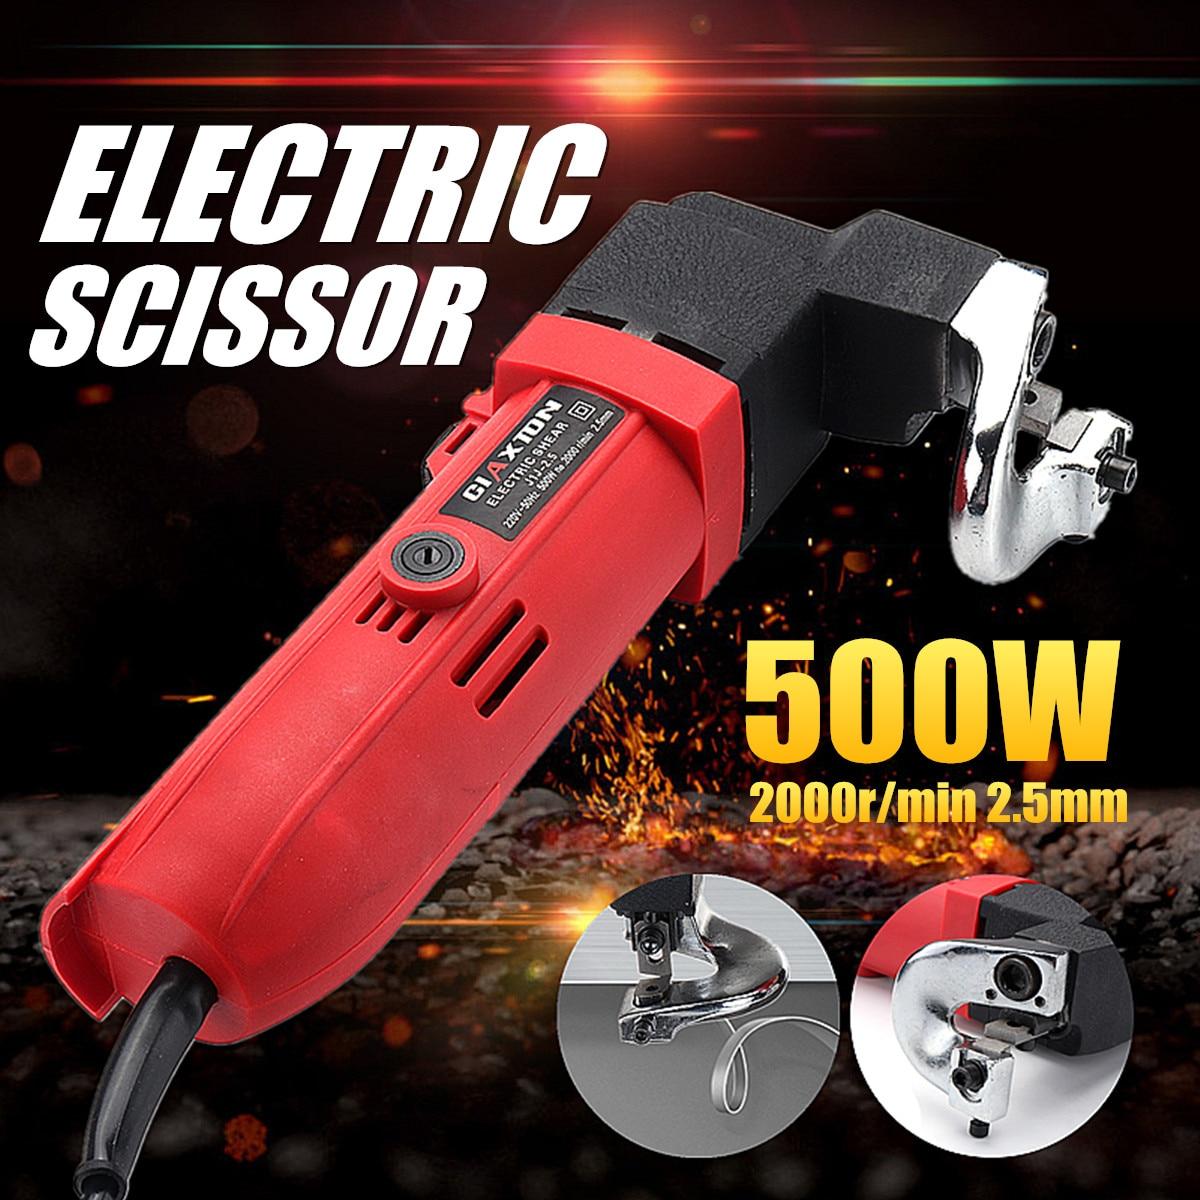 500W 220V EU Plug Professional Electric Sheet Metal Shear Snip Scissor Cutter 2000r/min Power Tool 290x77x145mm Aluminum Alloy